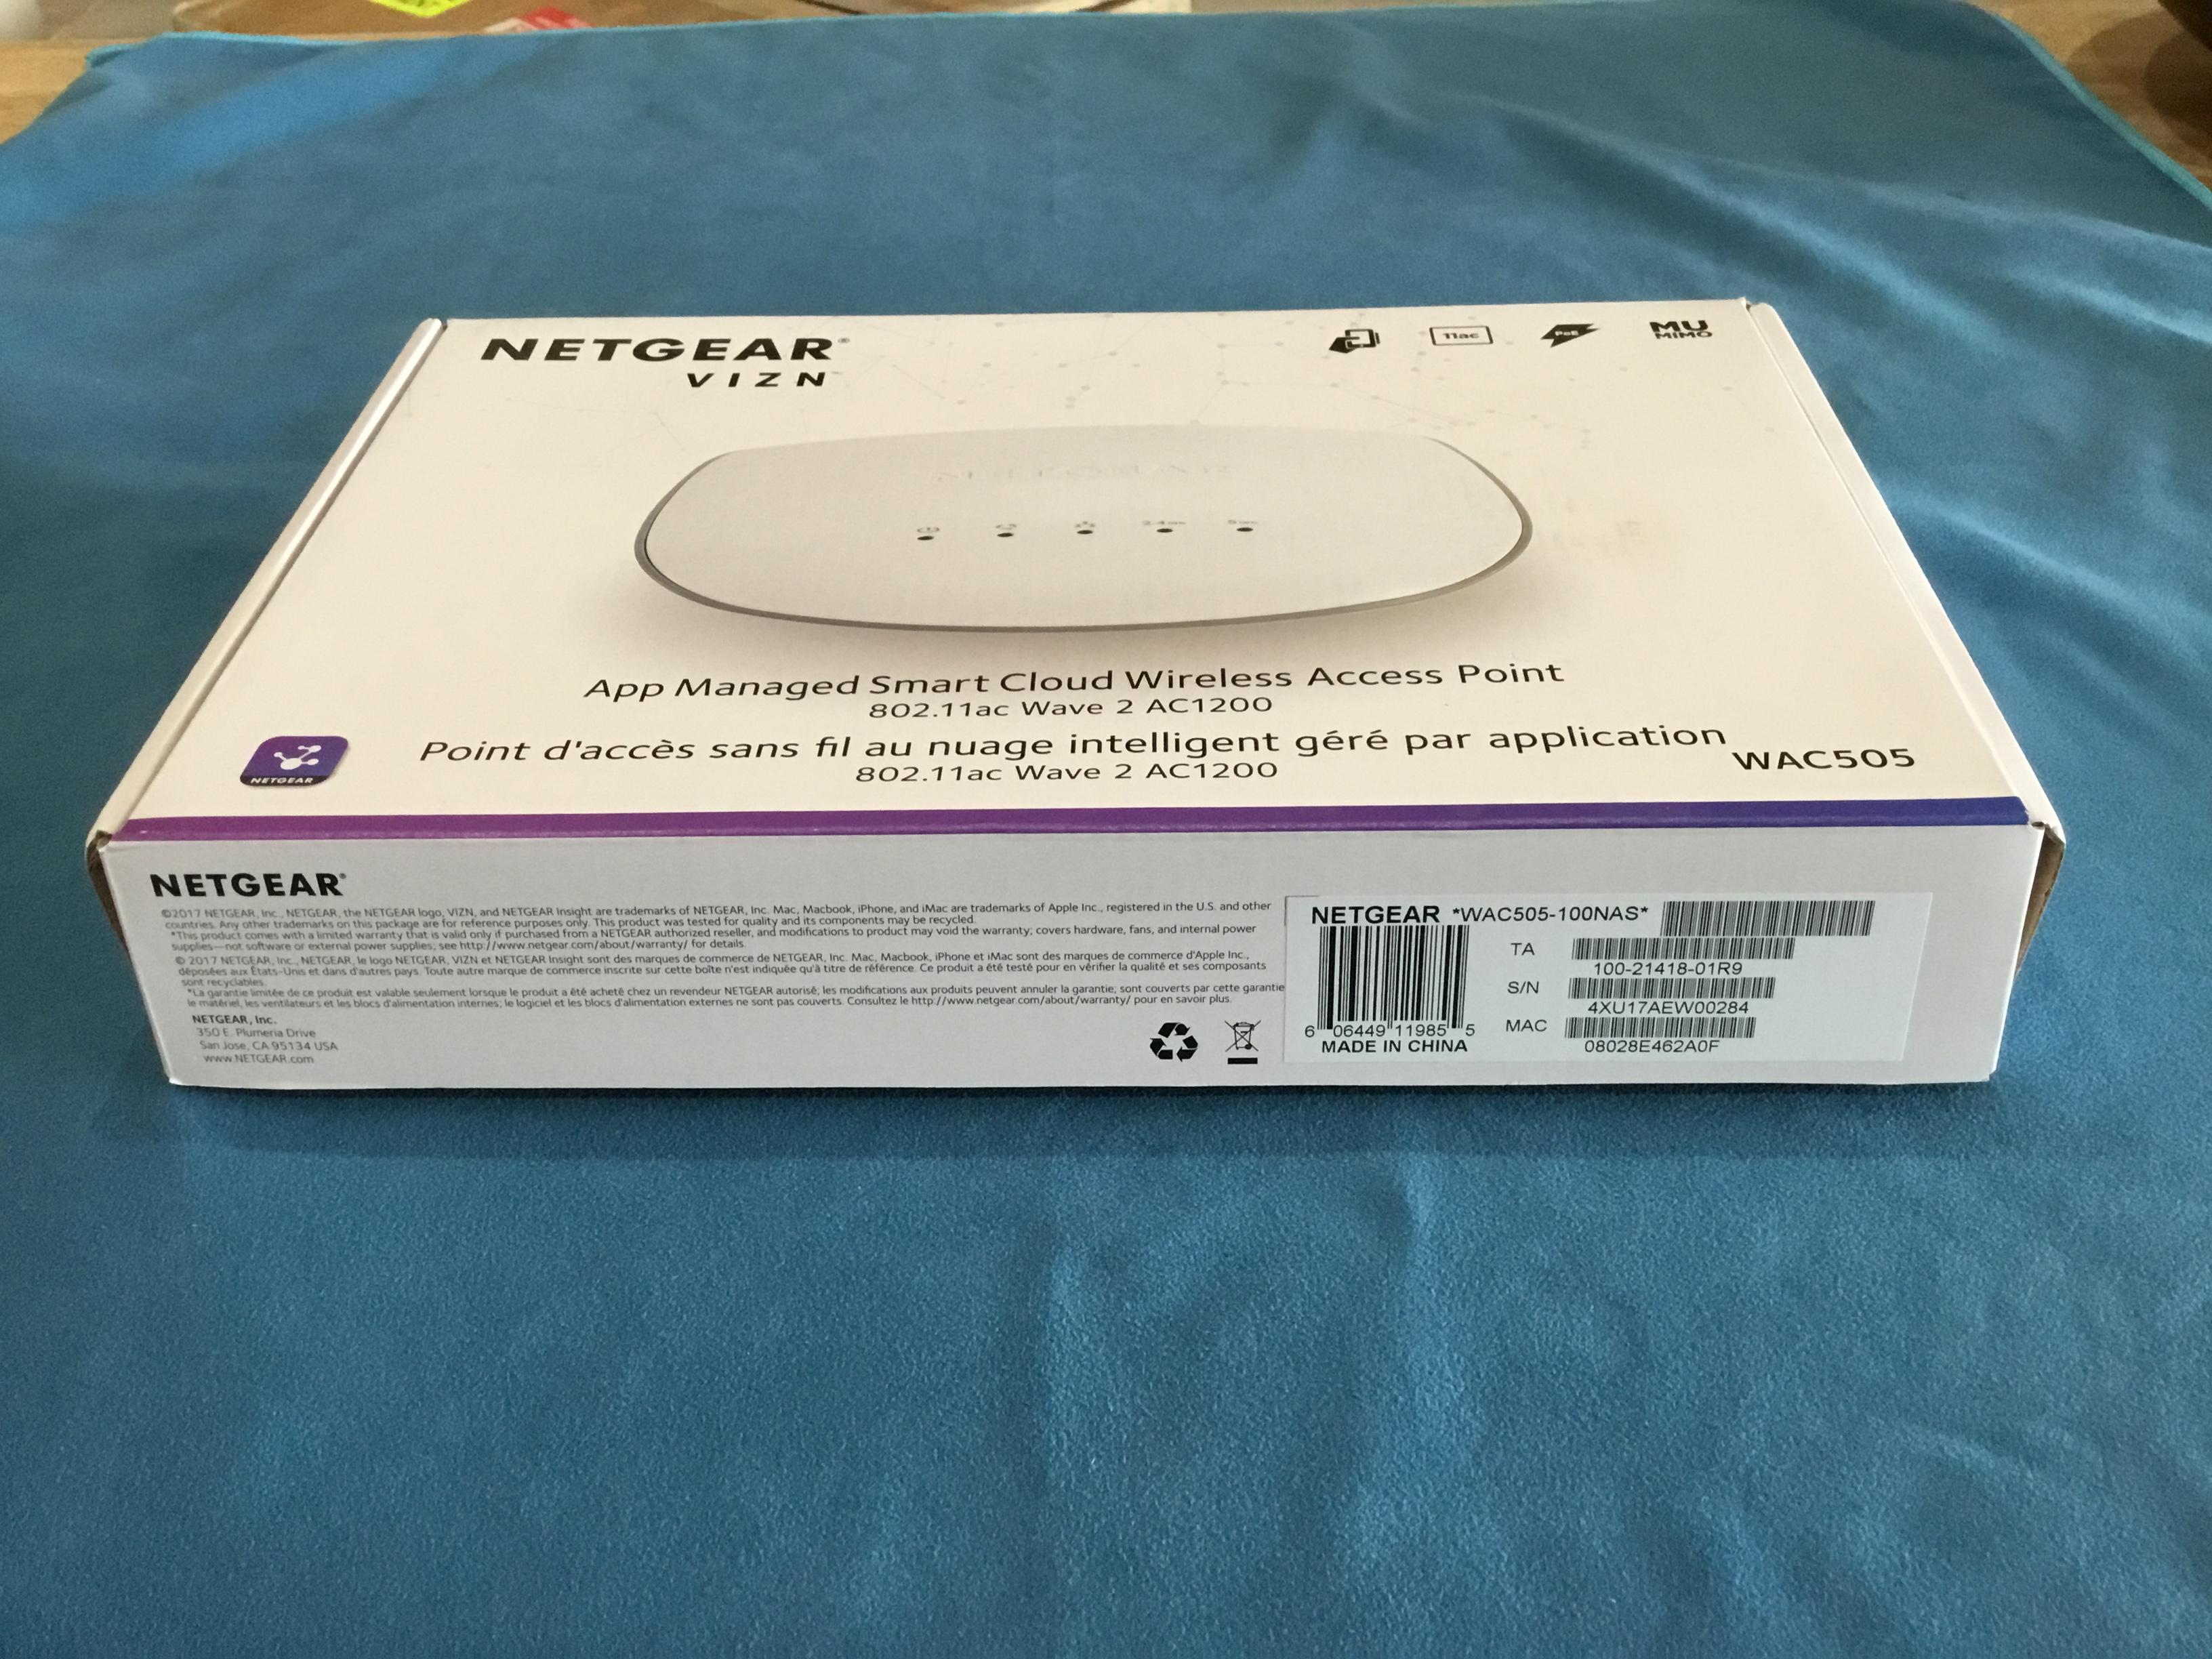 Netgear VIZN Wireless Access Point